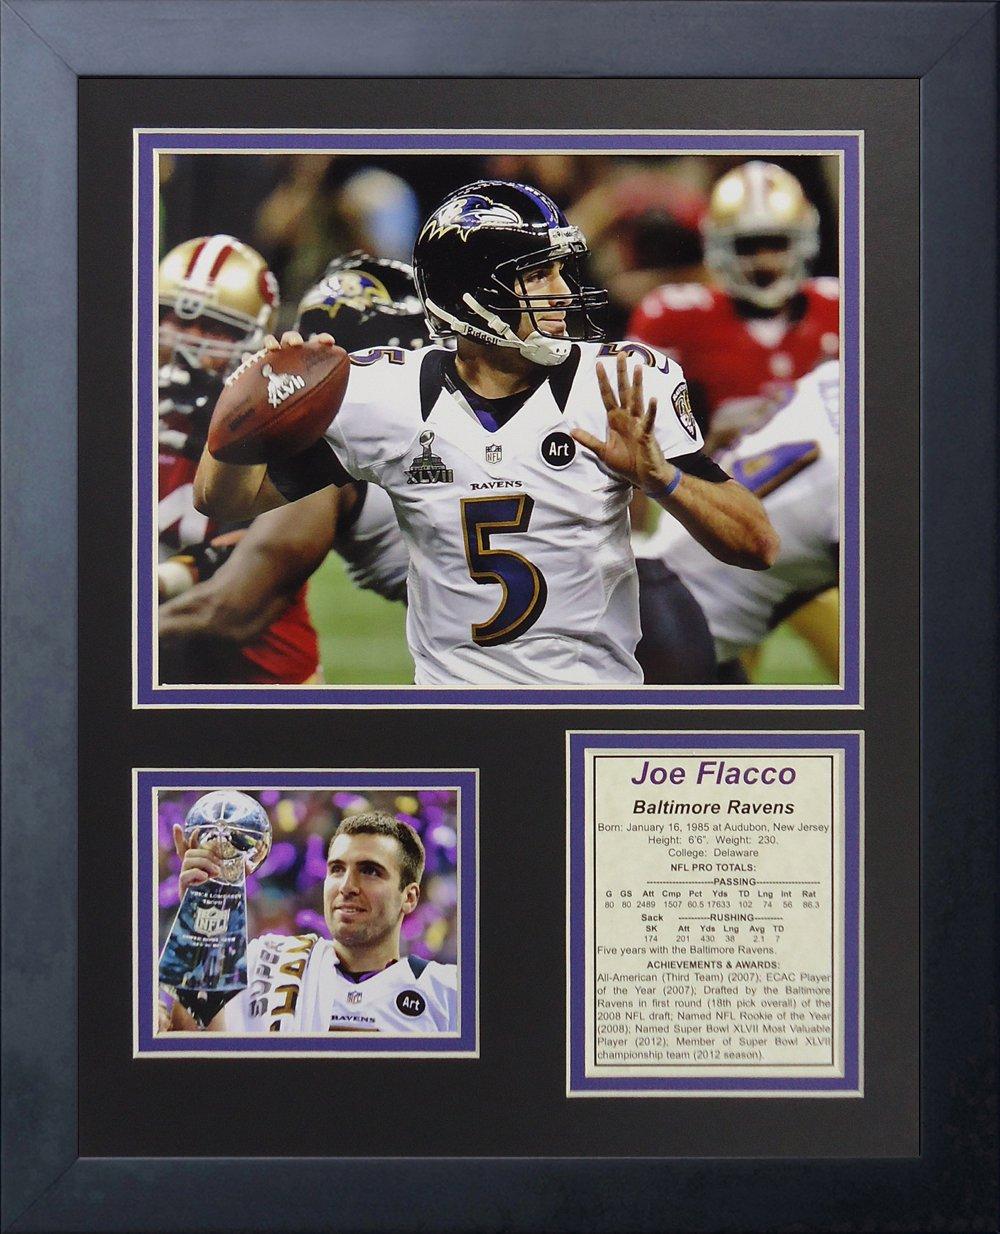 Legends Never Die Joe Flacco MVP Framed Photo Collage 11 x 14-Inch